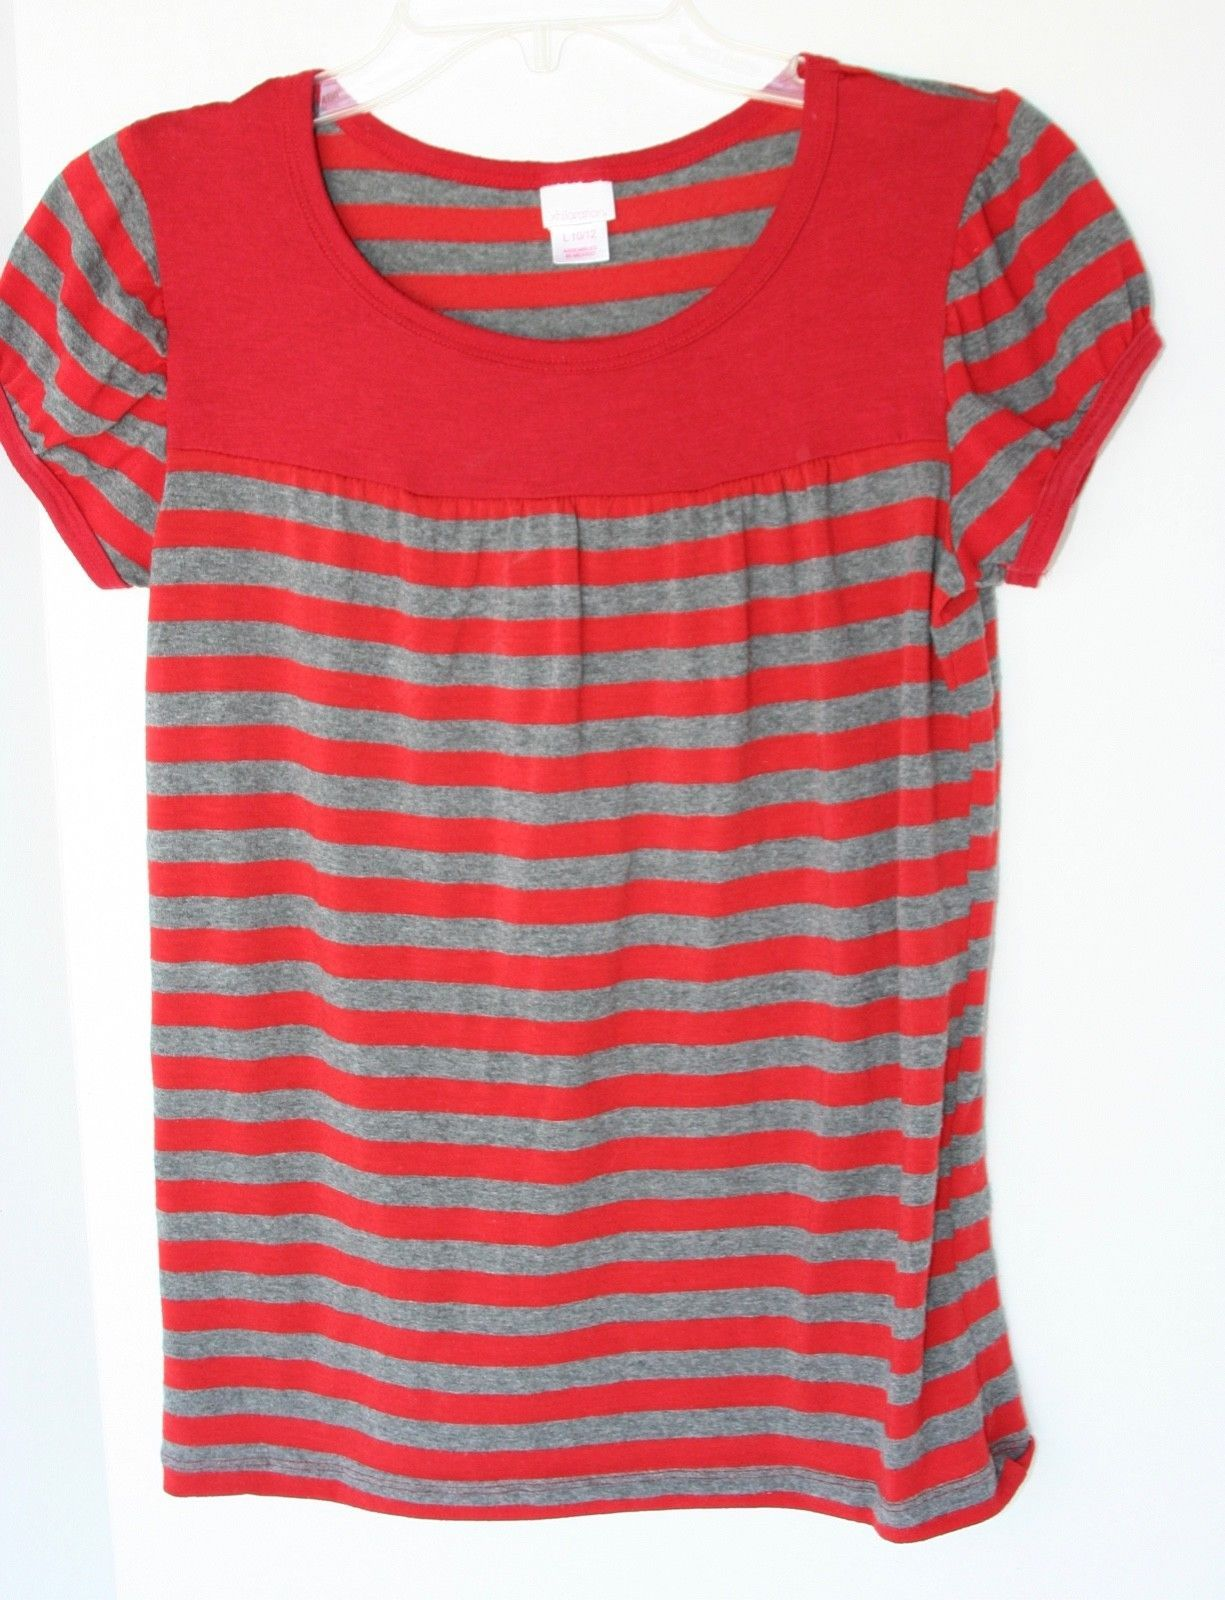 NWT Gymboree Girls Coral Striped Ruffle Neck Tank Top Sizes 5 6 7 8 10 12